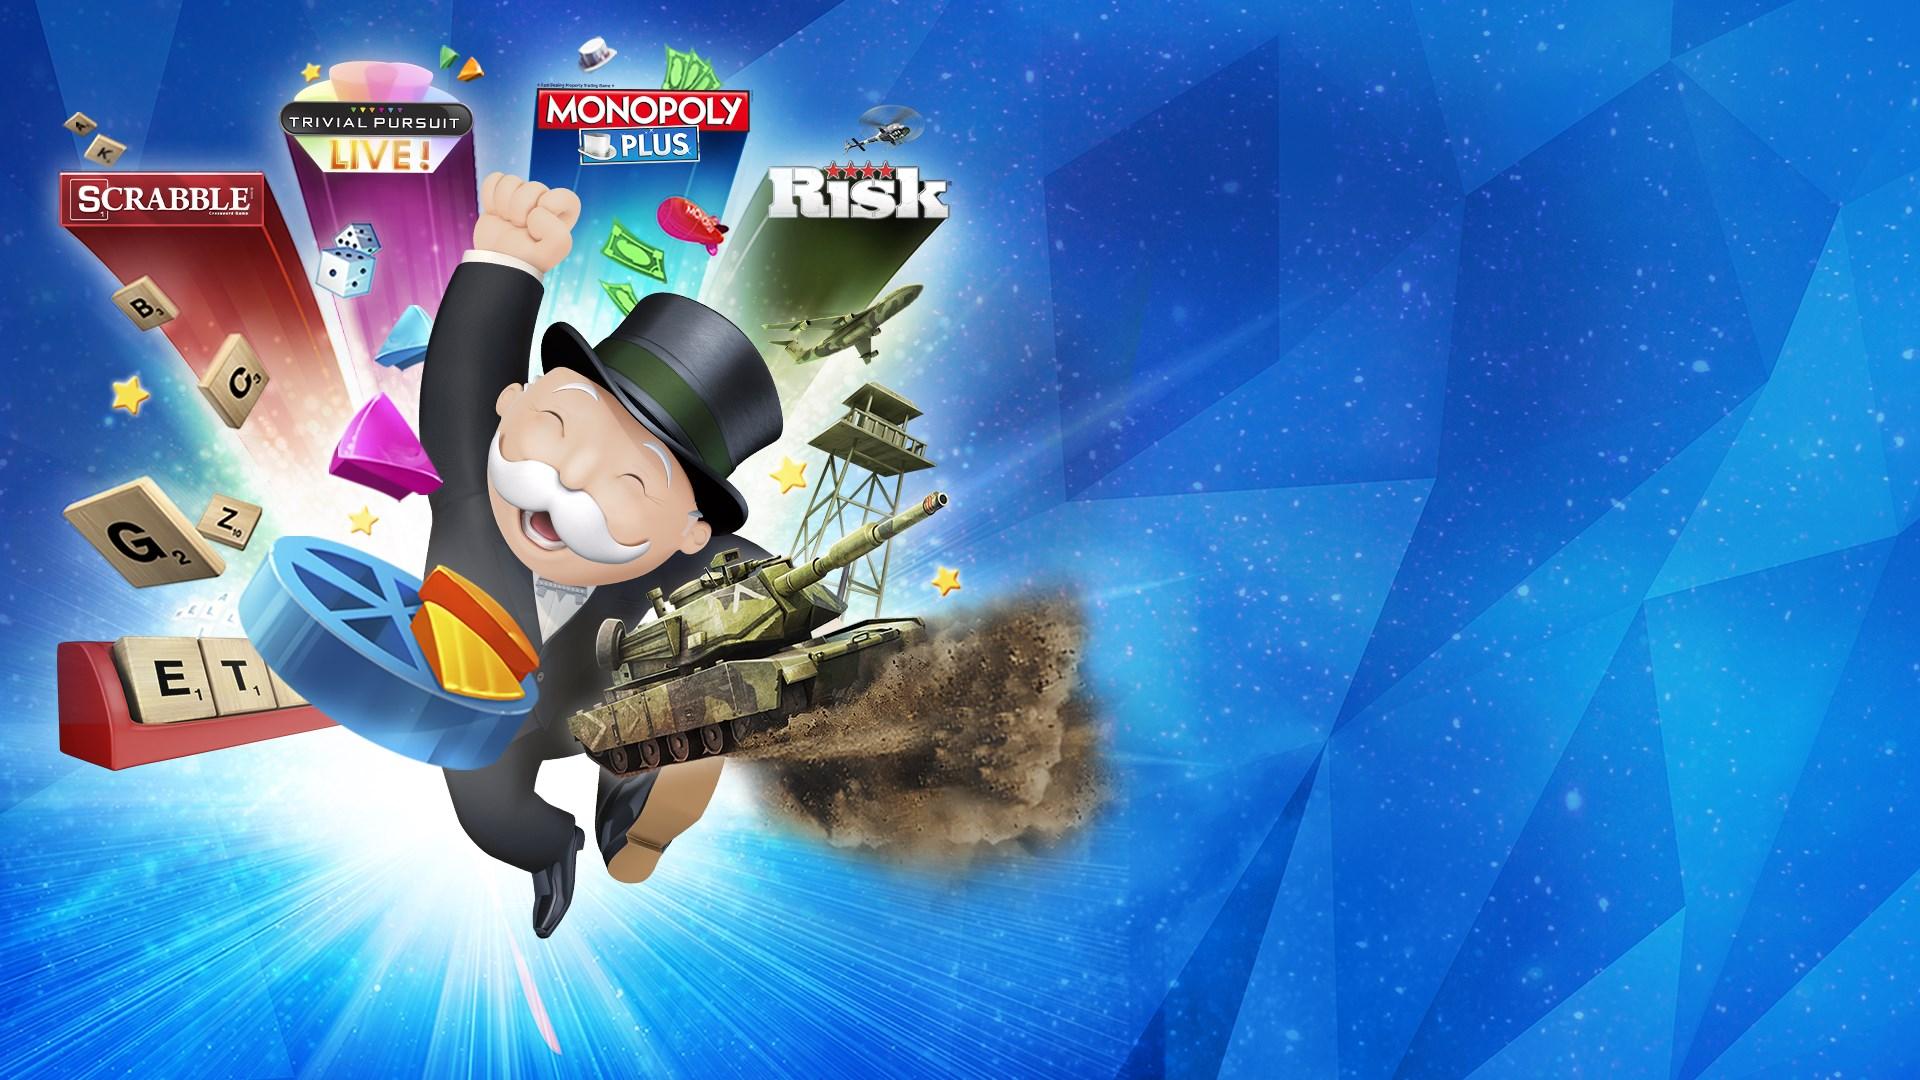 Hasbro scrabble download free. full version